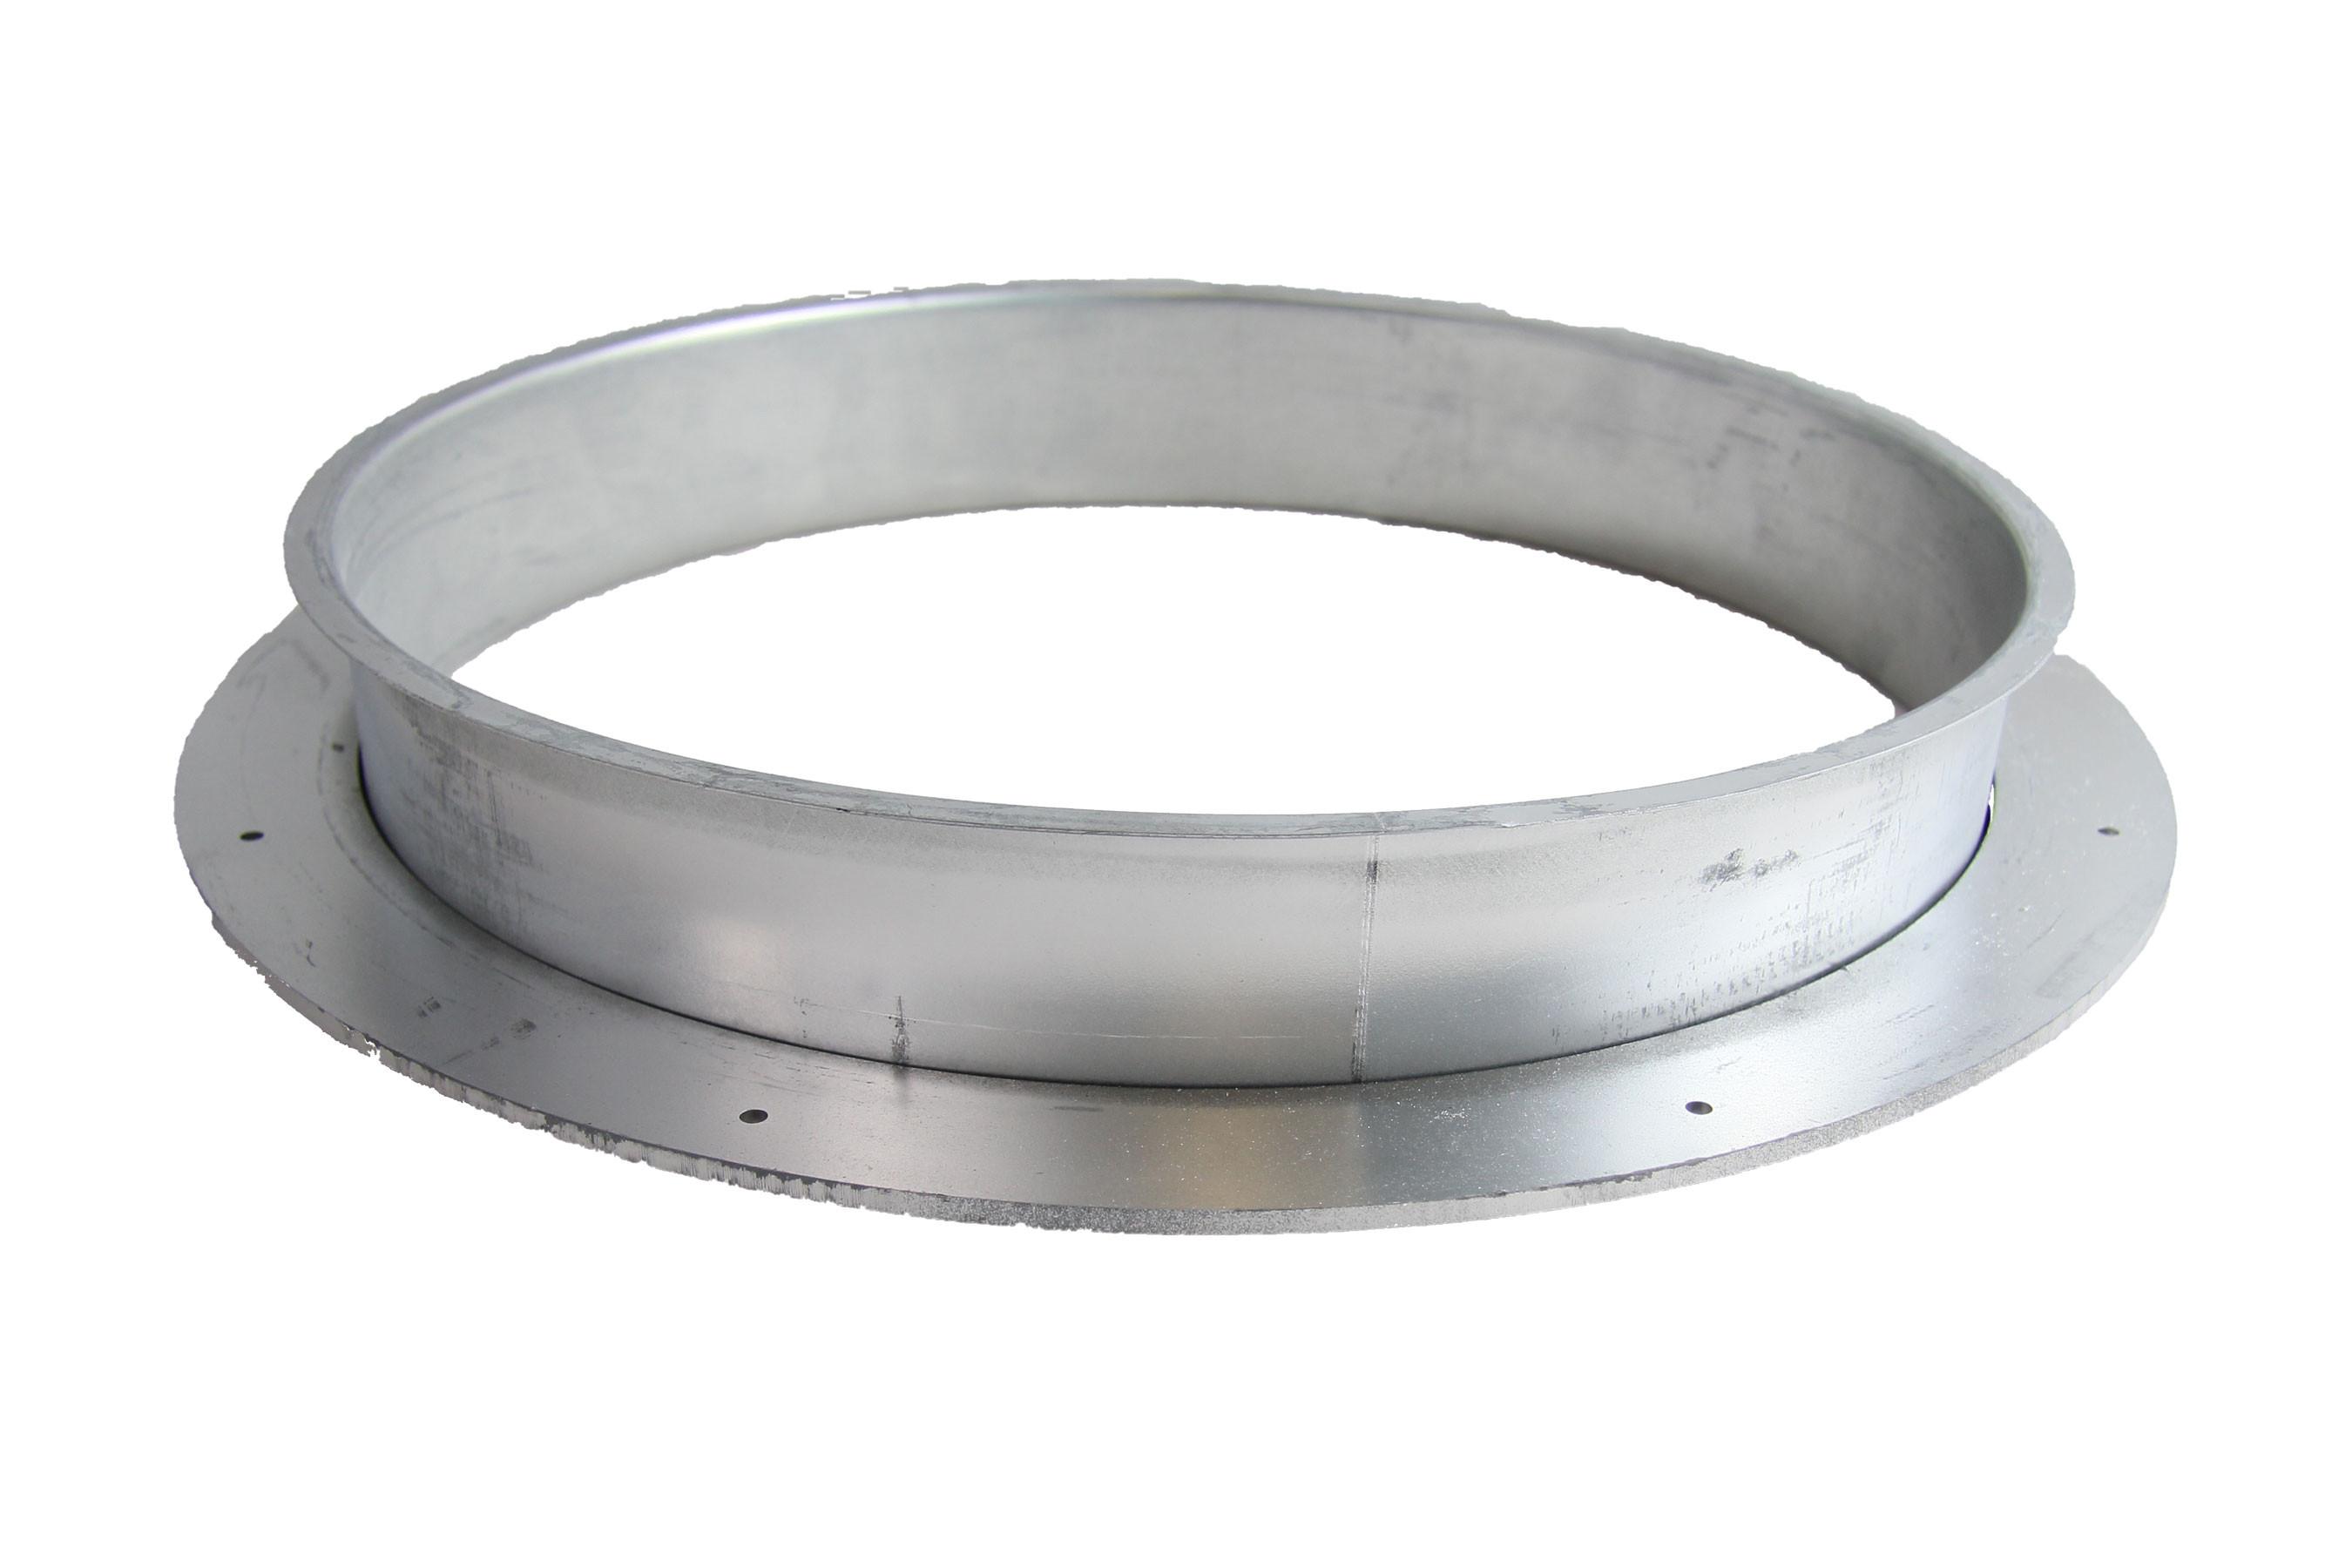 Rohrflange NW 305 - Höhe 50 mm